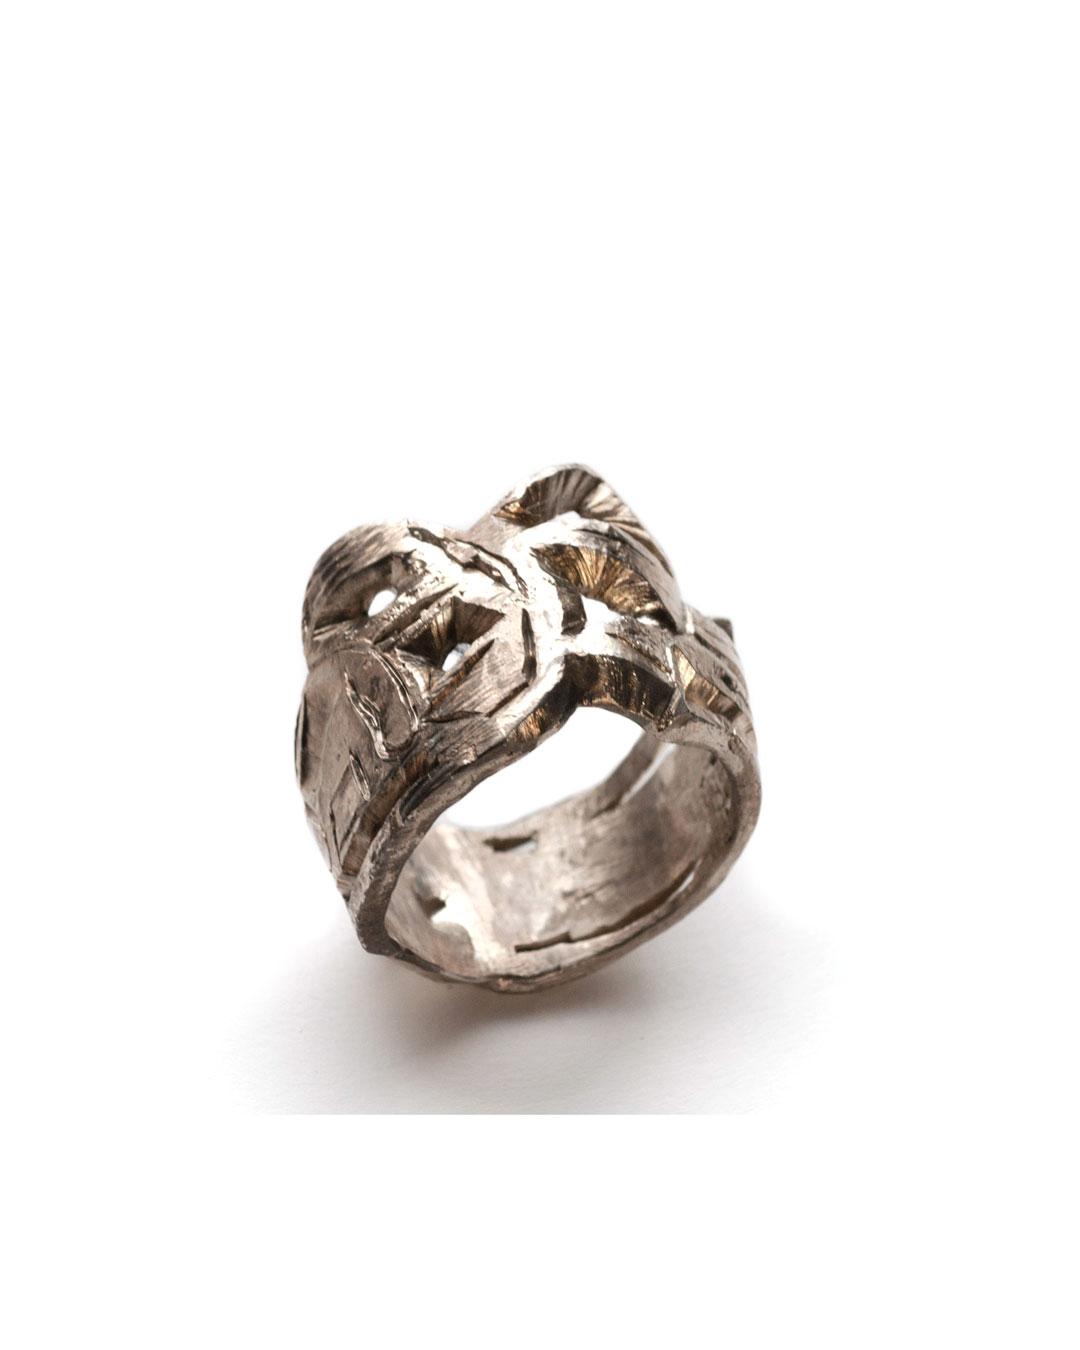 Rudolf Kocéa, untitled, 2007, ring; silver, 24 x 23 x 11 mm, €655